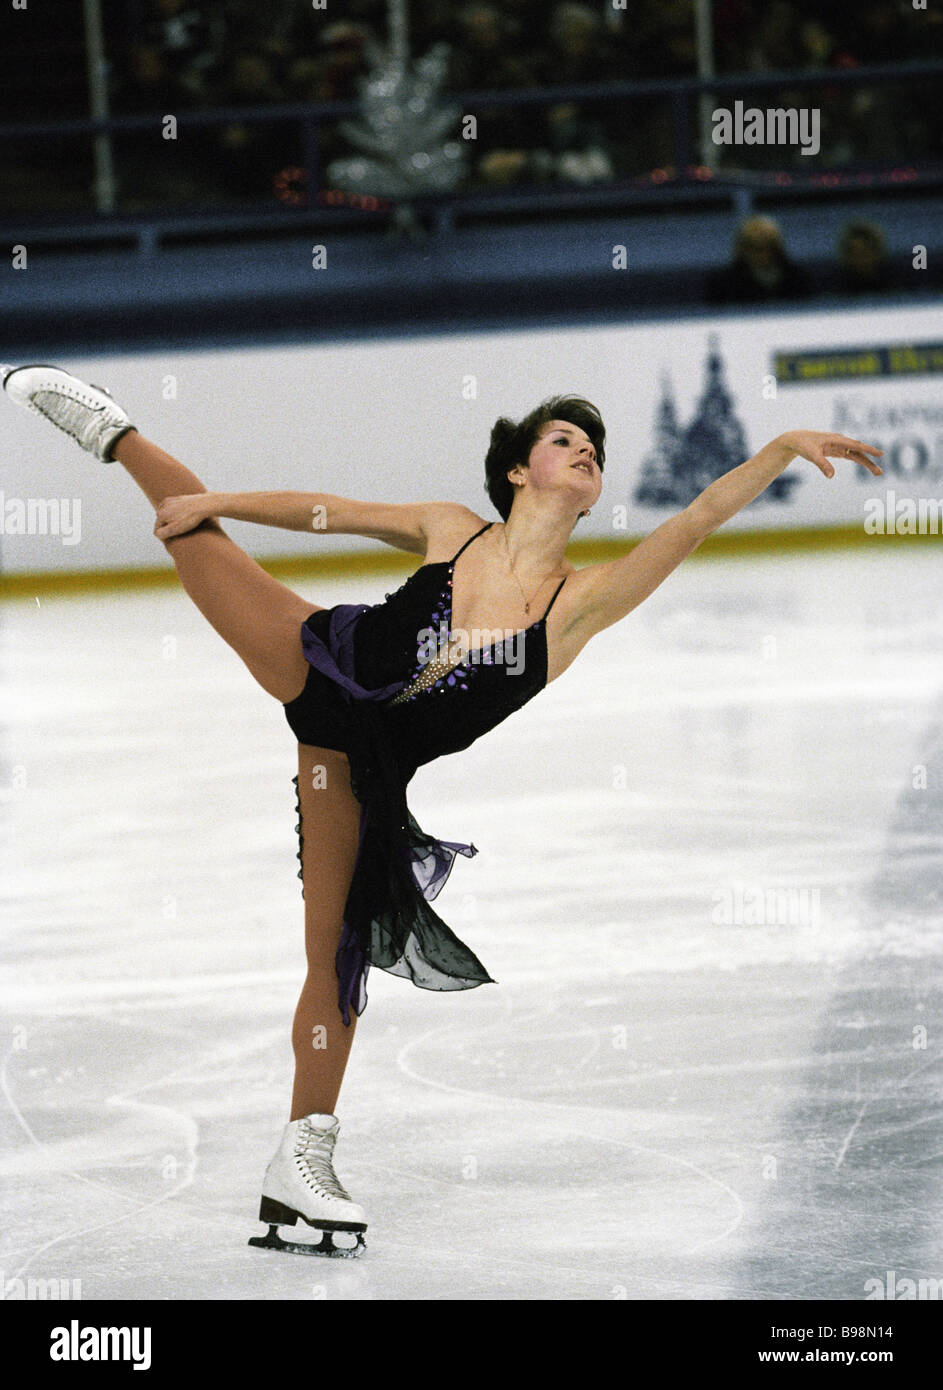 Irina Slutskaya today 28